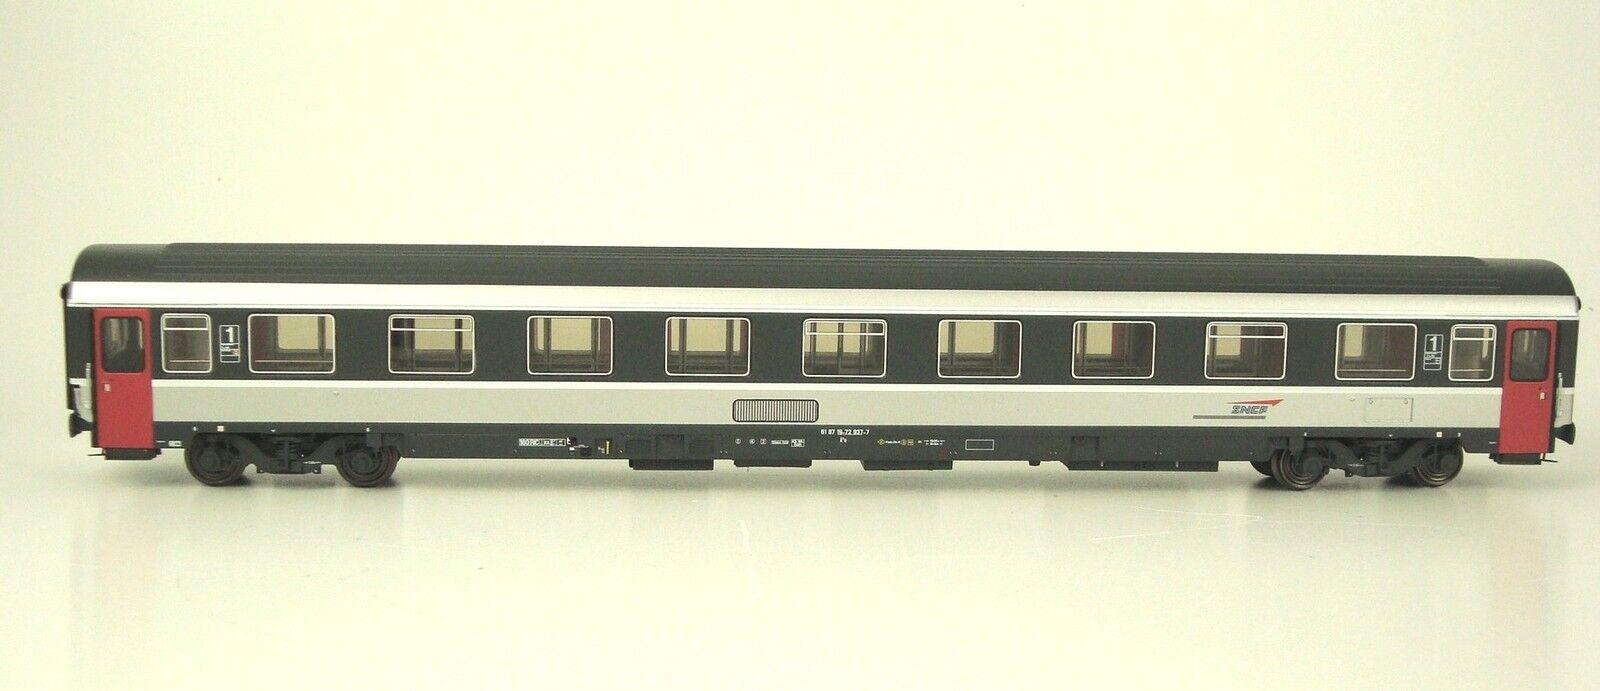 LS Models 40359 SNCF 1. KL. EUROFIMA carrello a9u VSE Corail + Grigio/silb ep5 NUOVO + OVP